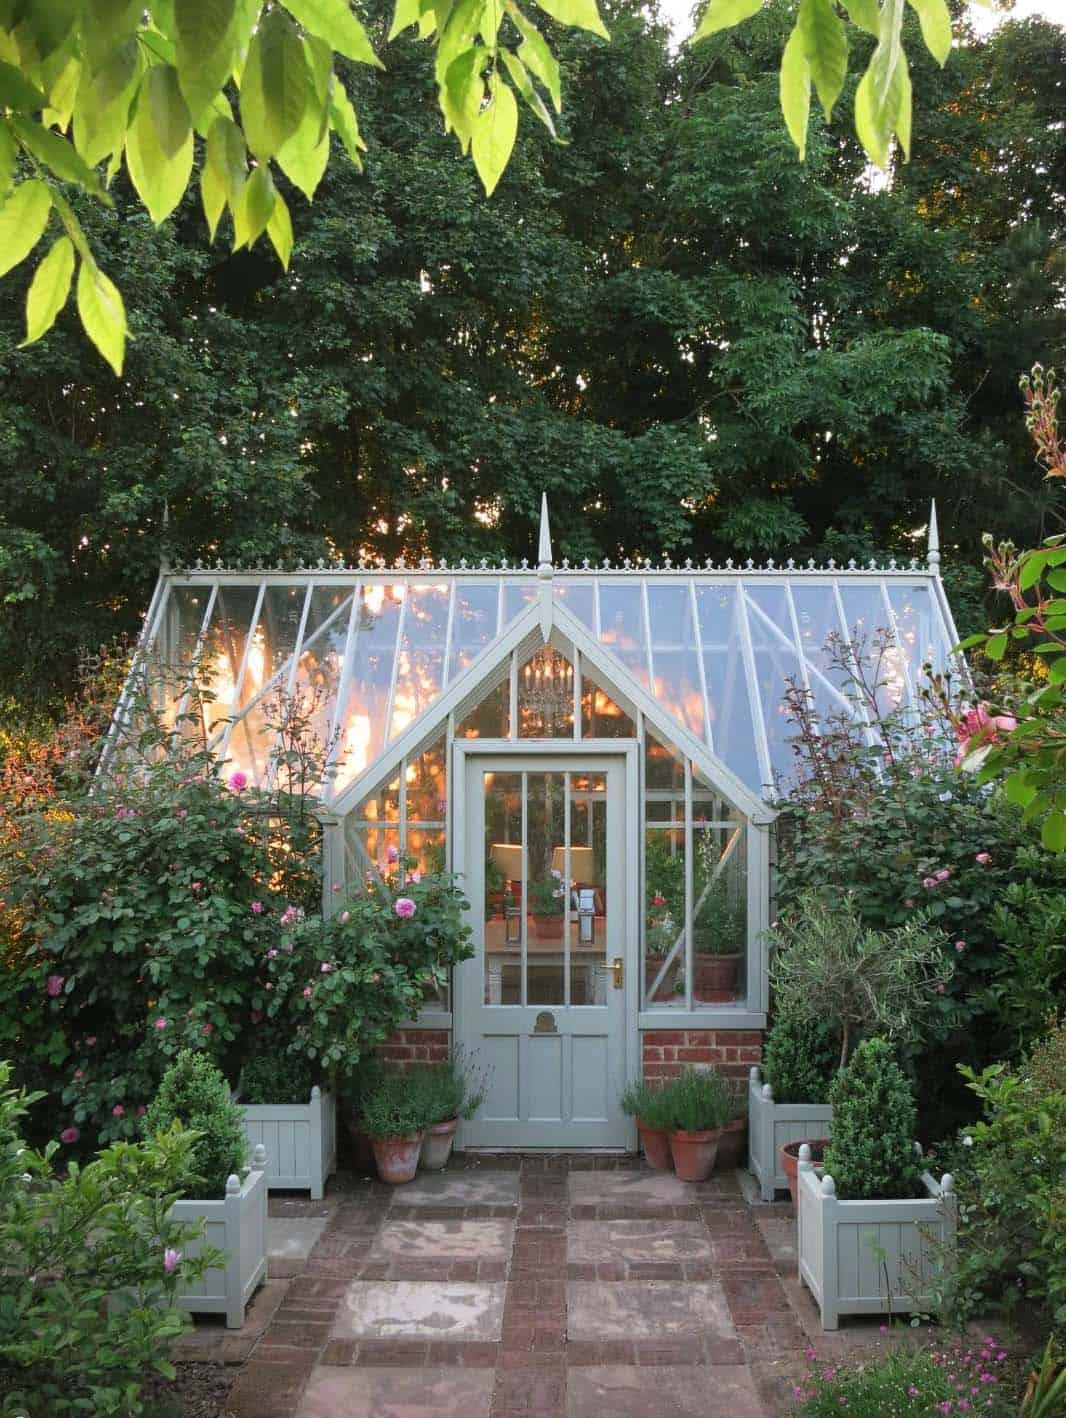 Amazing-Conservatory-Greenhouse-Ideas-11-1-Kindesign